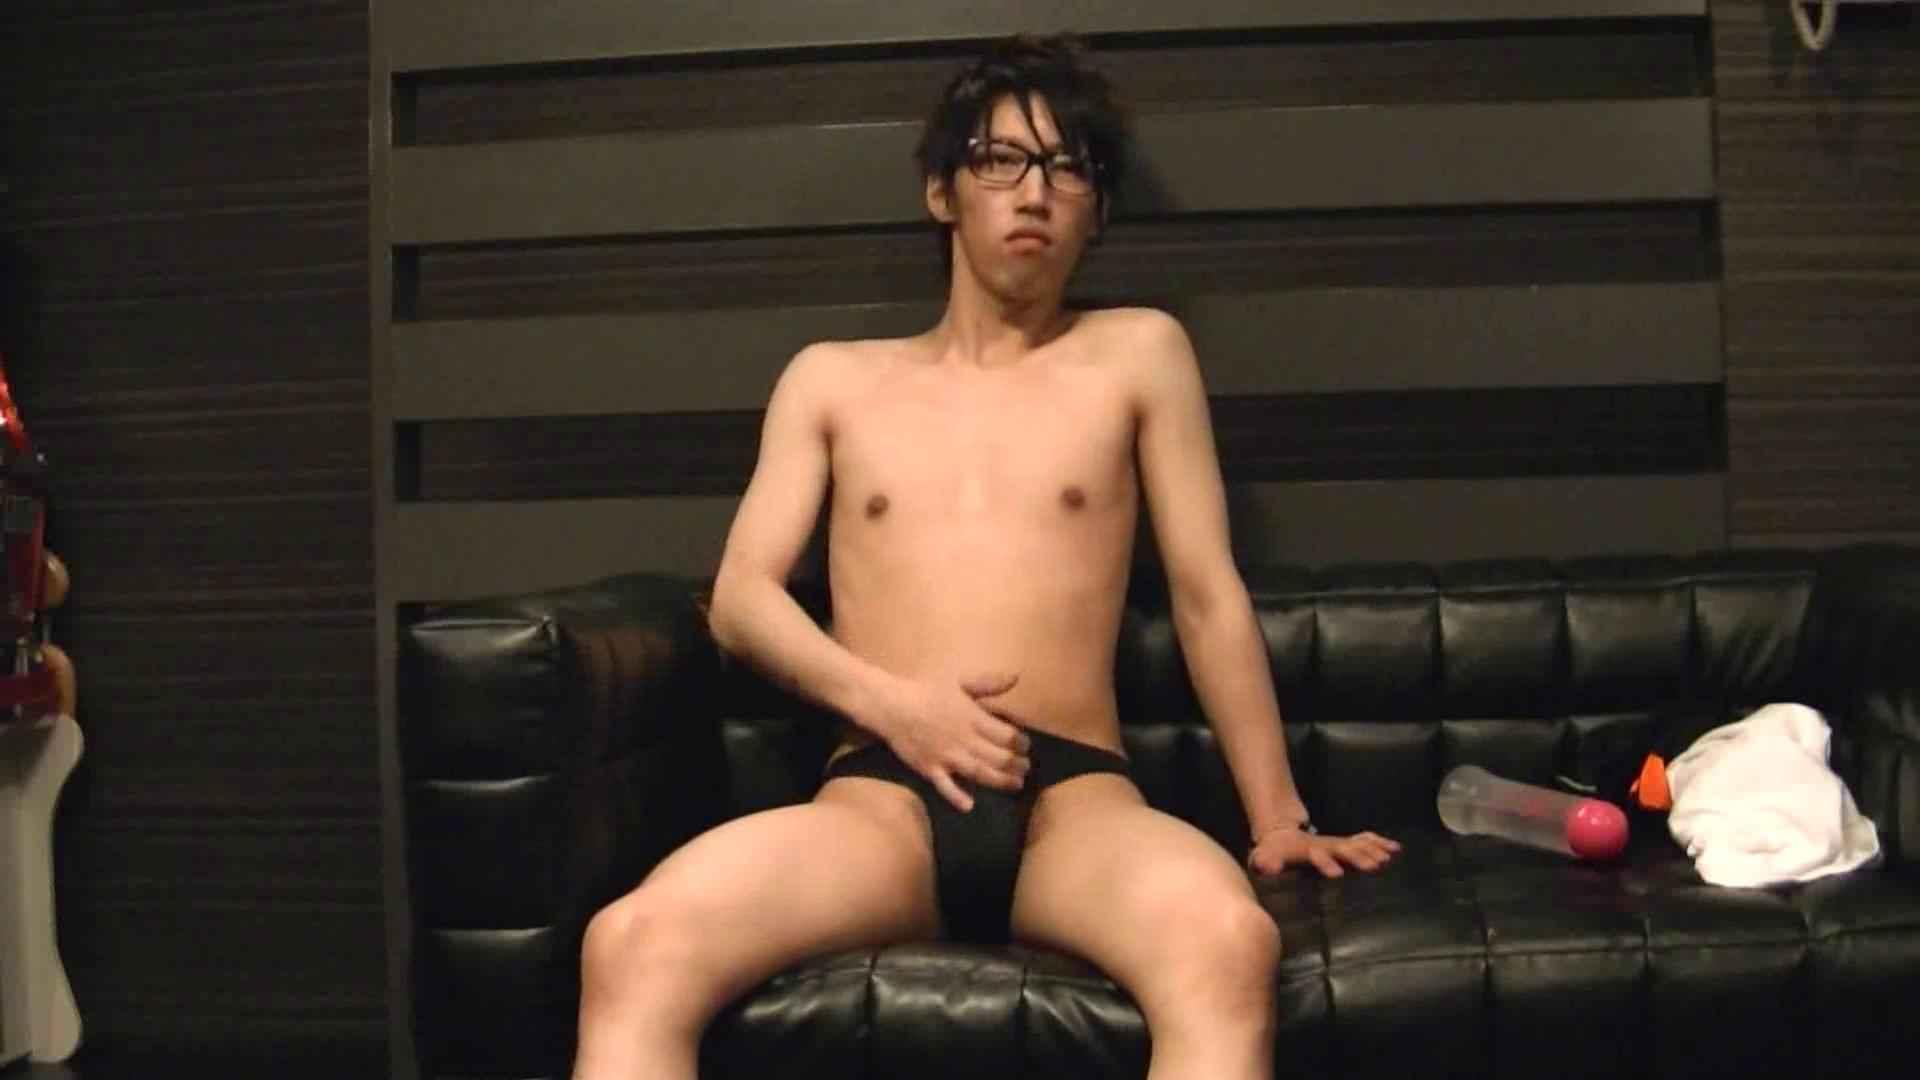 ONA見せカーニバル!! Vol3 男 ゲイ無料無修正画像 89枚 23